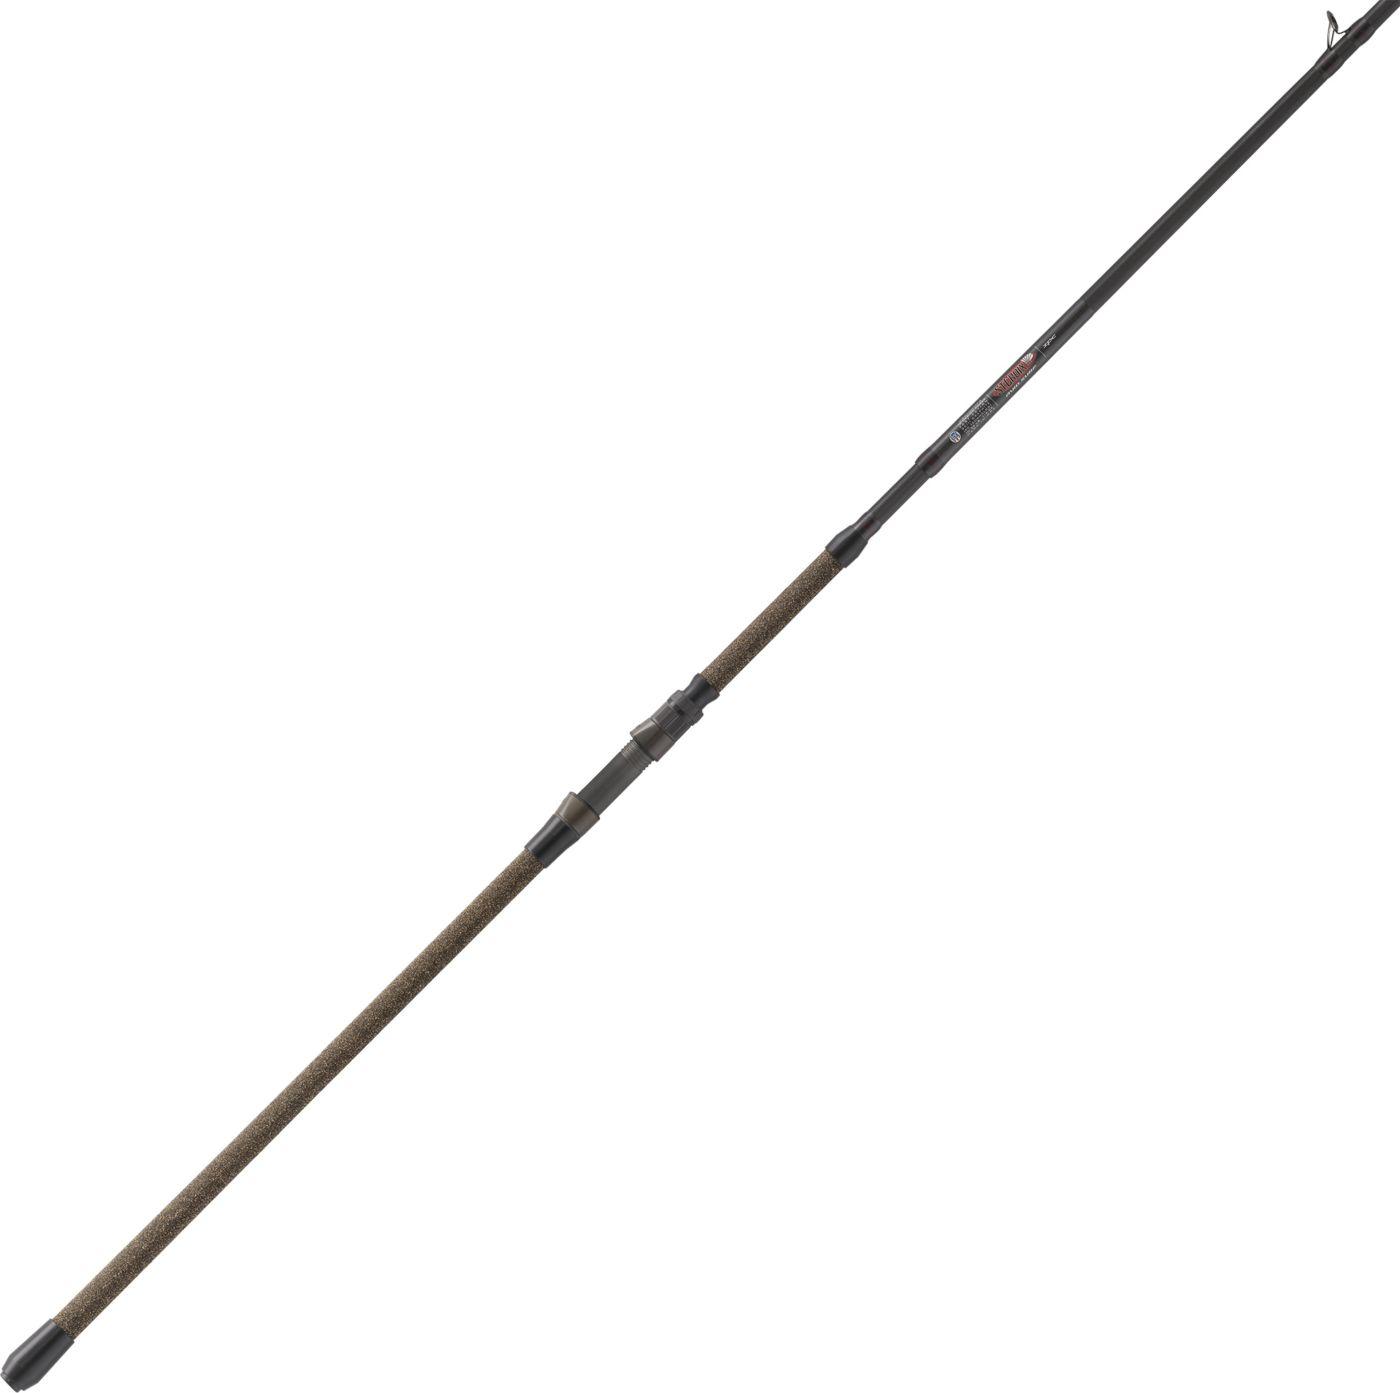 St. Croix Avid Series Surf Casting Rod